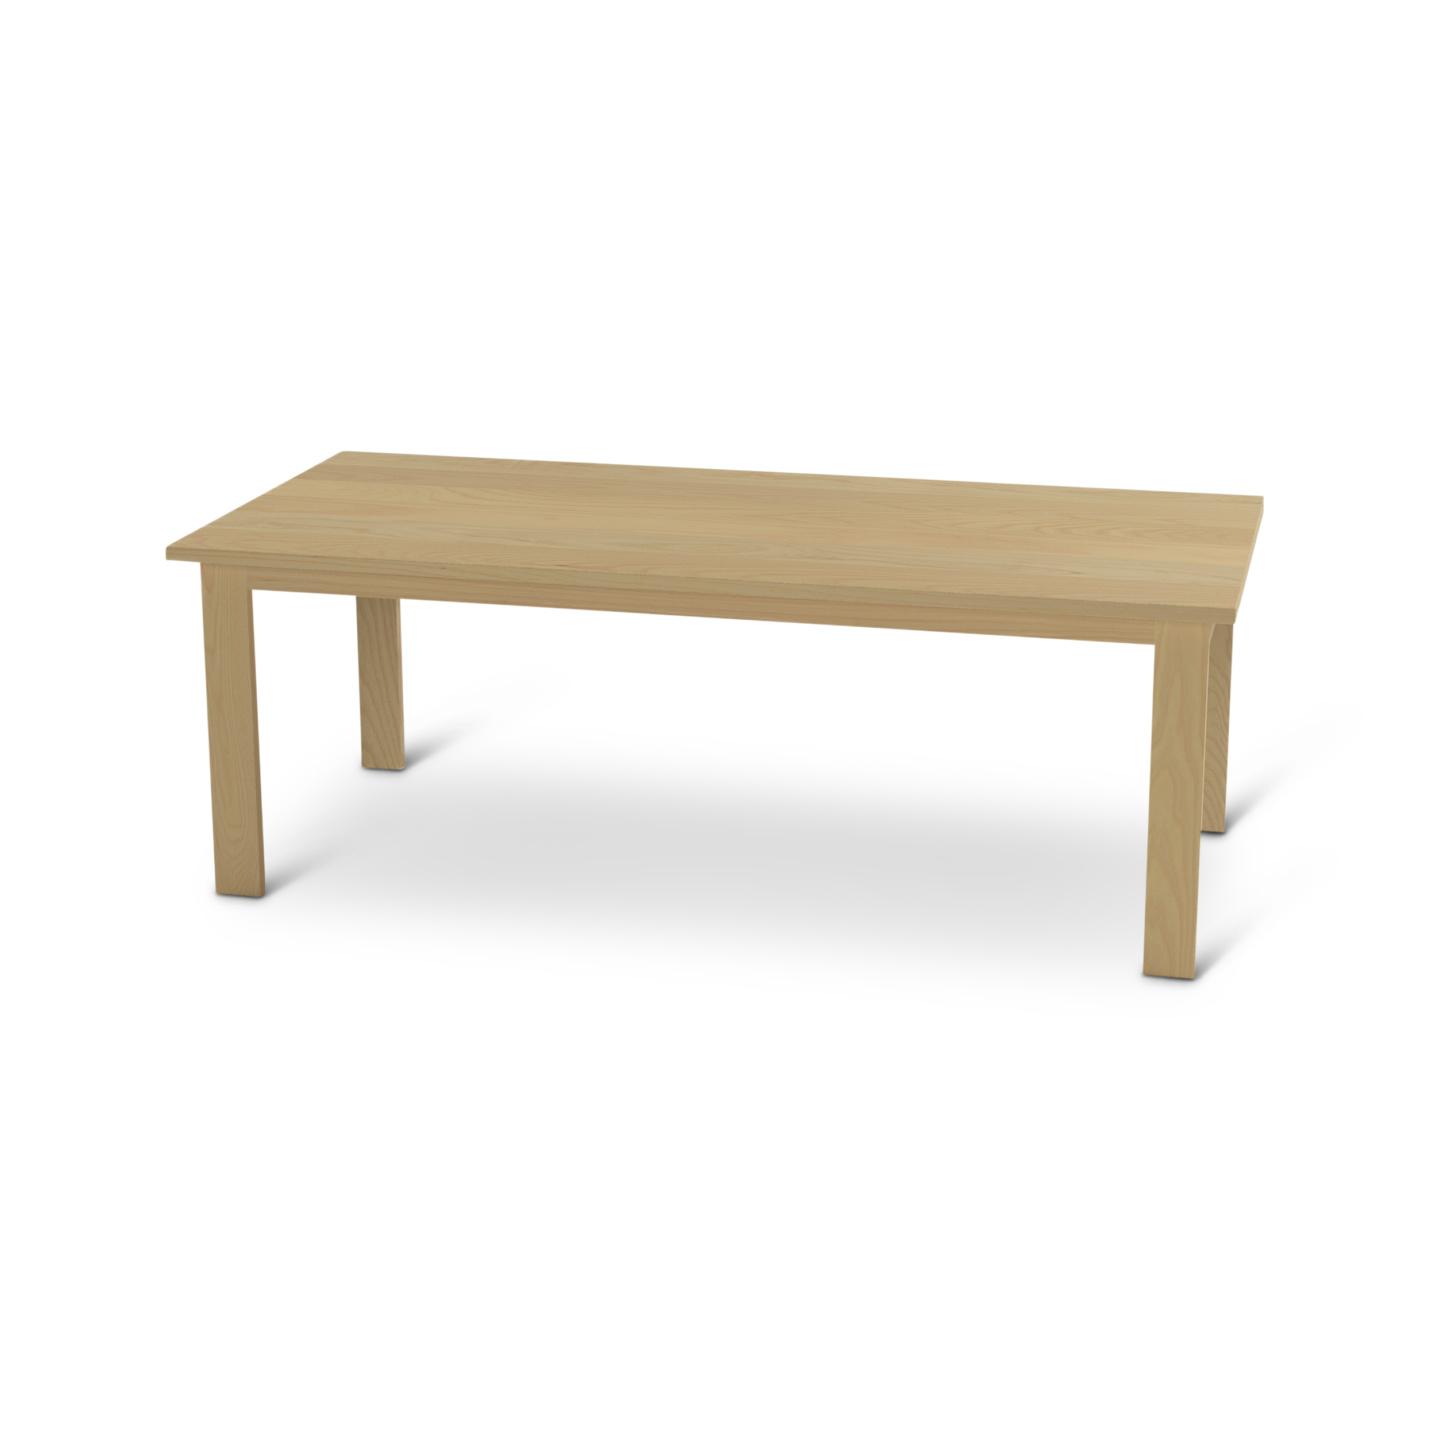 Solid Ash Scandinavian Dining Room Table